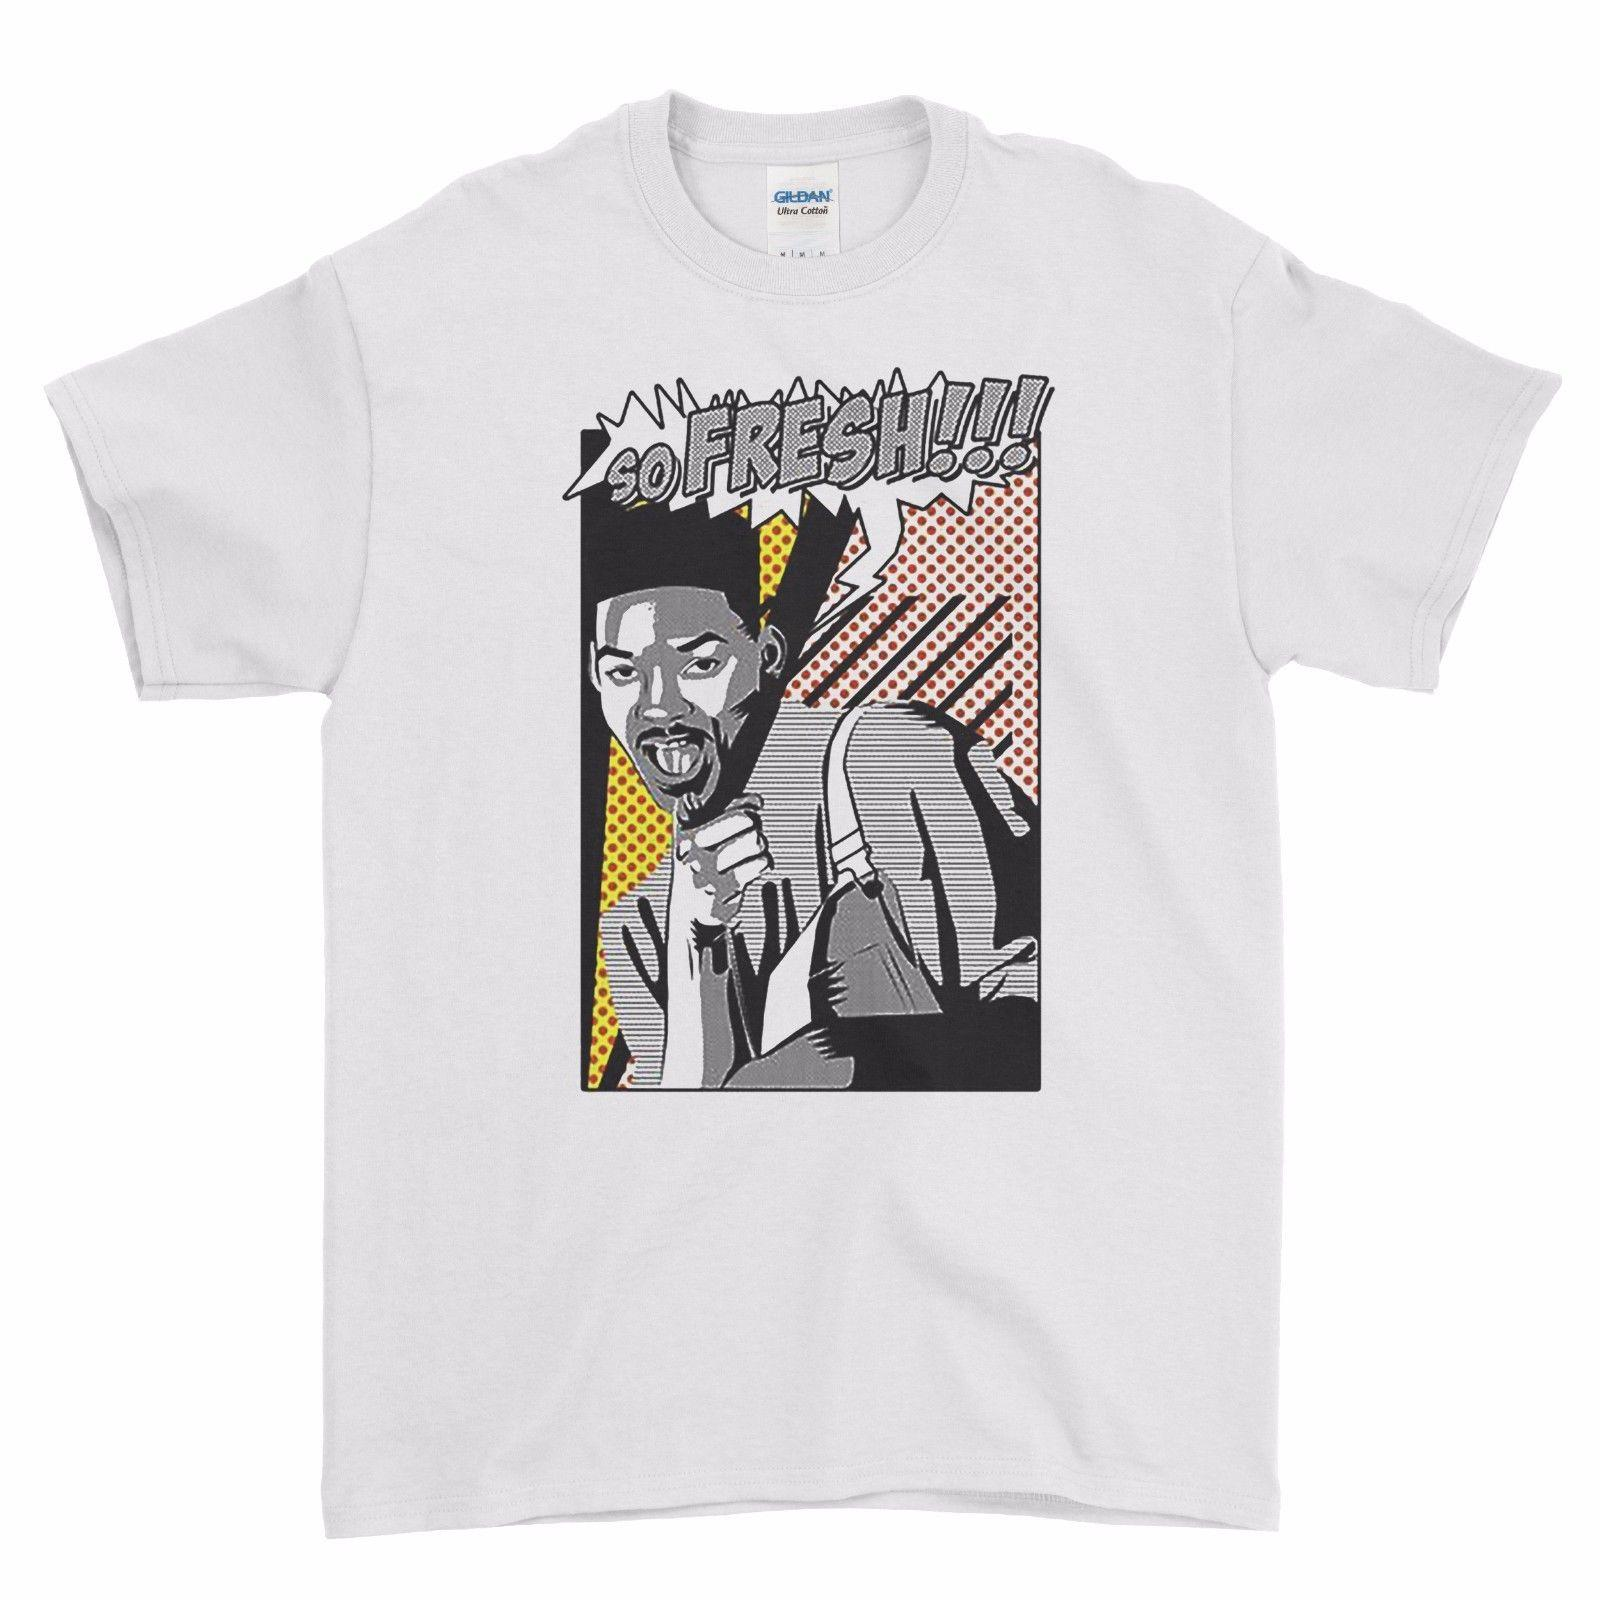 0fcb95bfc99e 90 S Fresh Prince Wholesale Discount Hipster Will Smith Boys Men T Shirt  Top Tee Cartoon Hip Hop Shirt Design T Shirts Casual Cool Hilarious T Shirts  ...